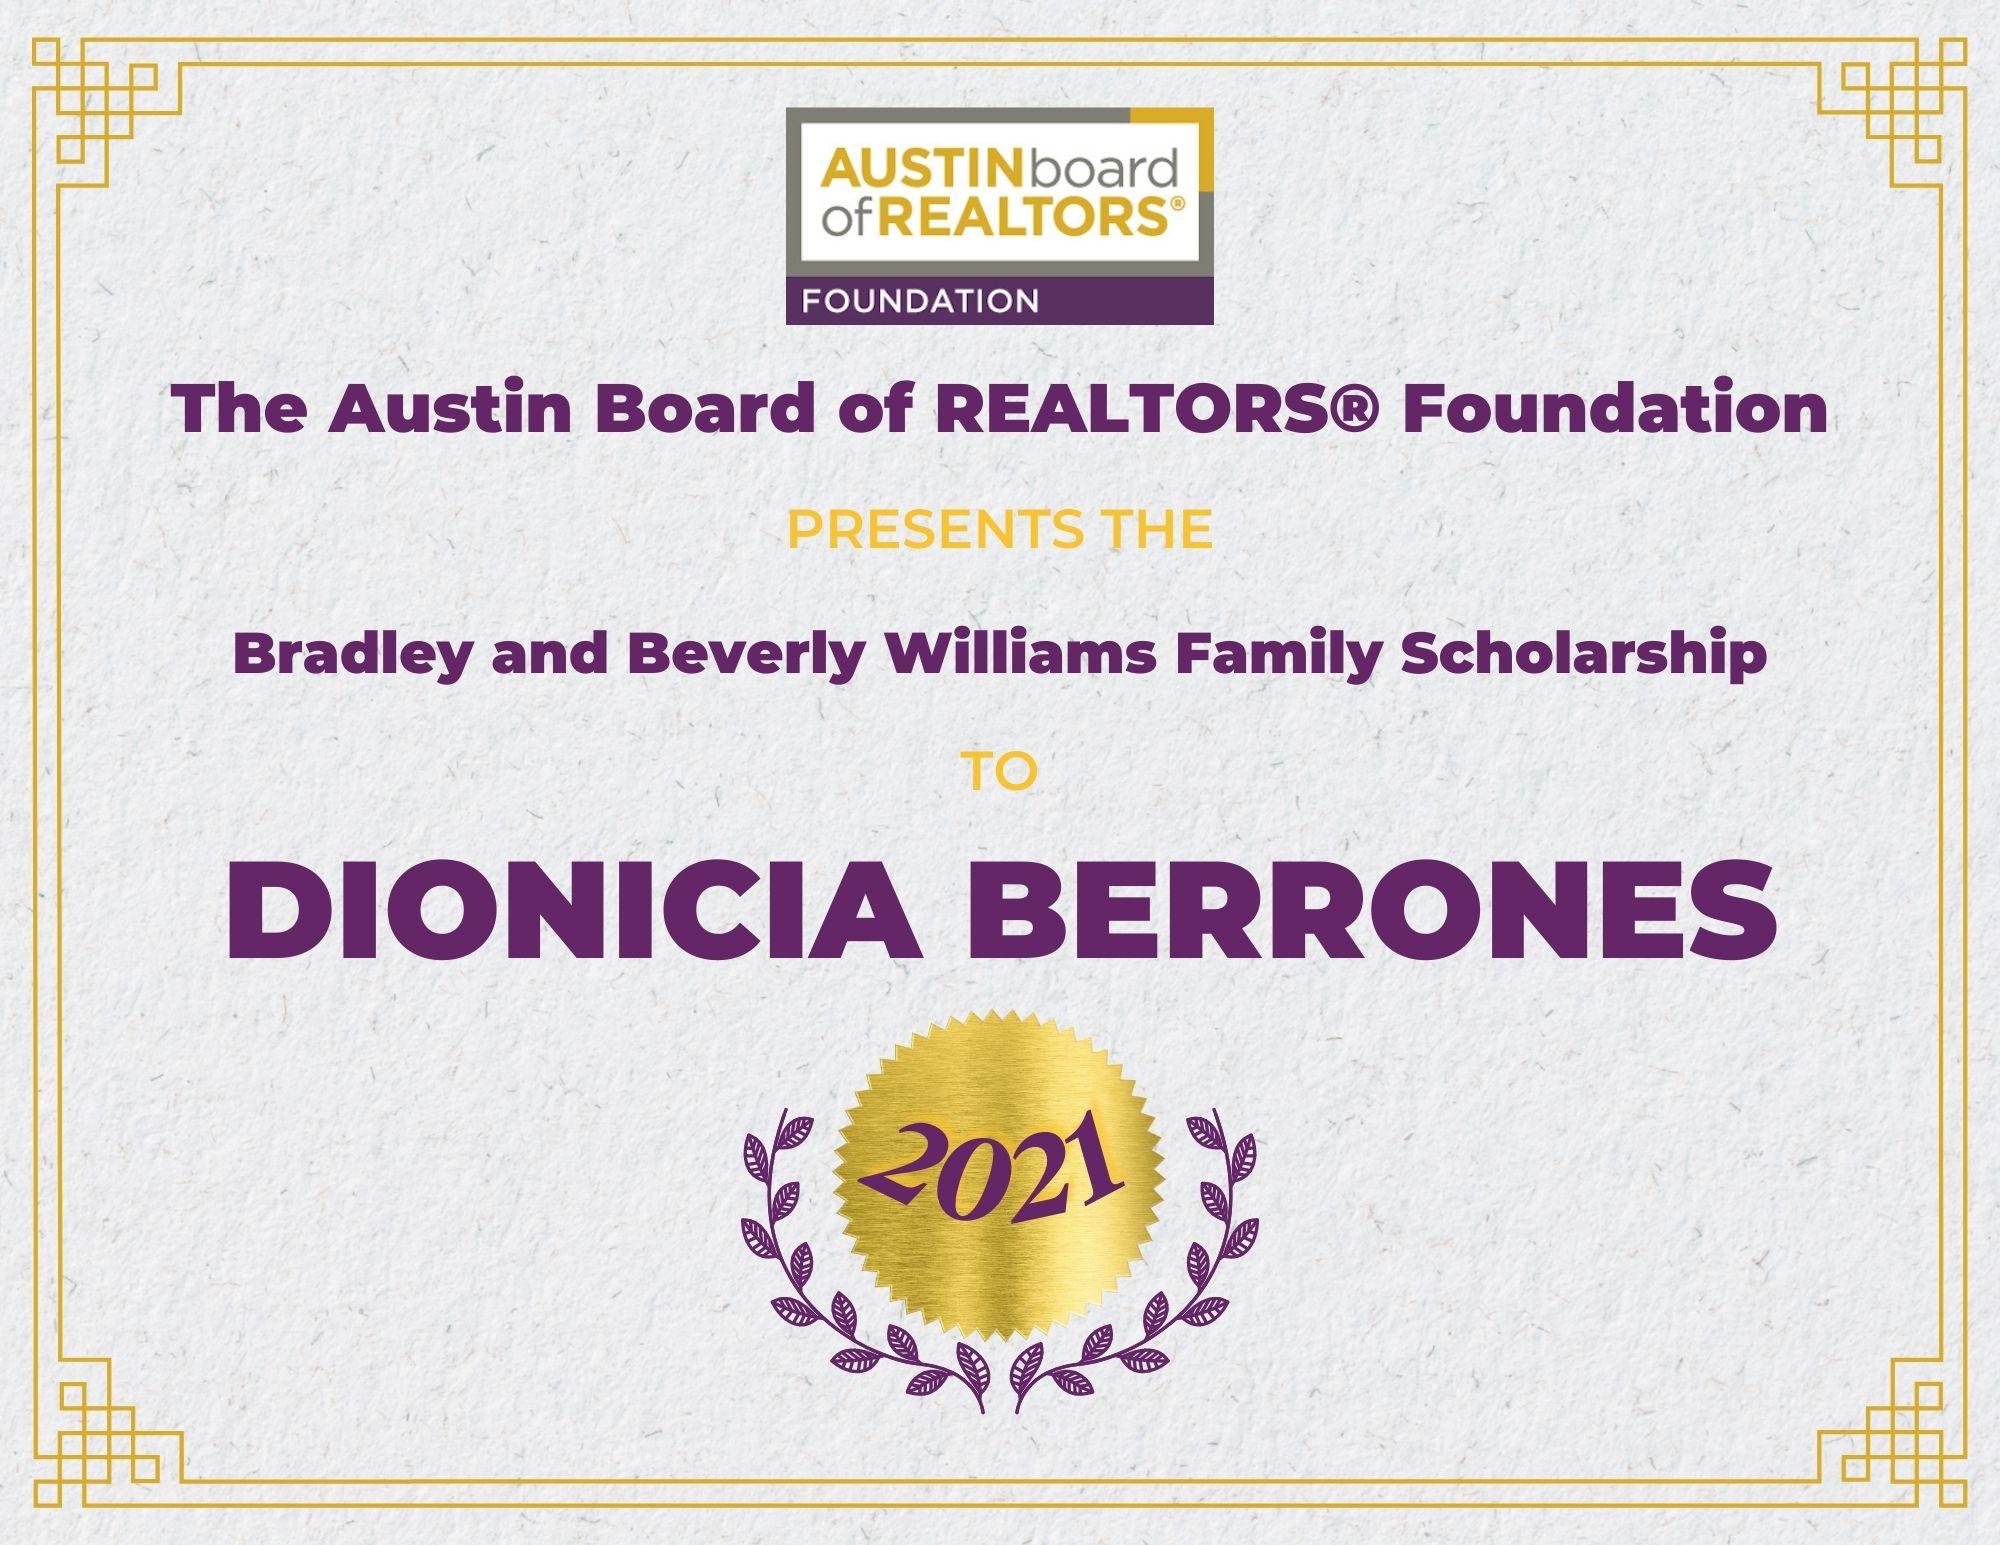 2021 Fou Scholarship Certificate Dioniciaberrones